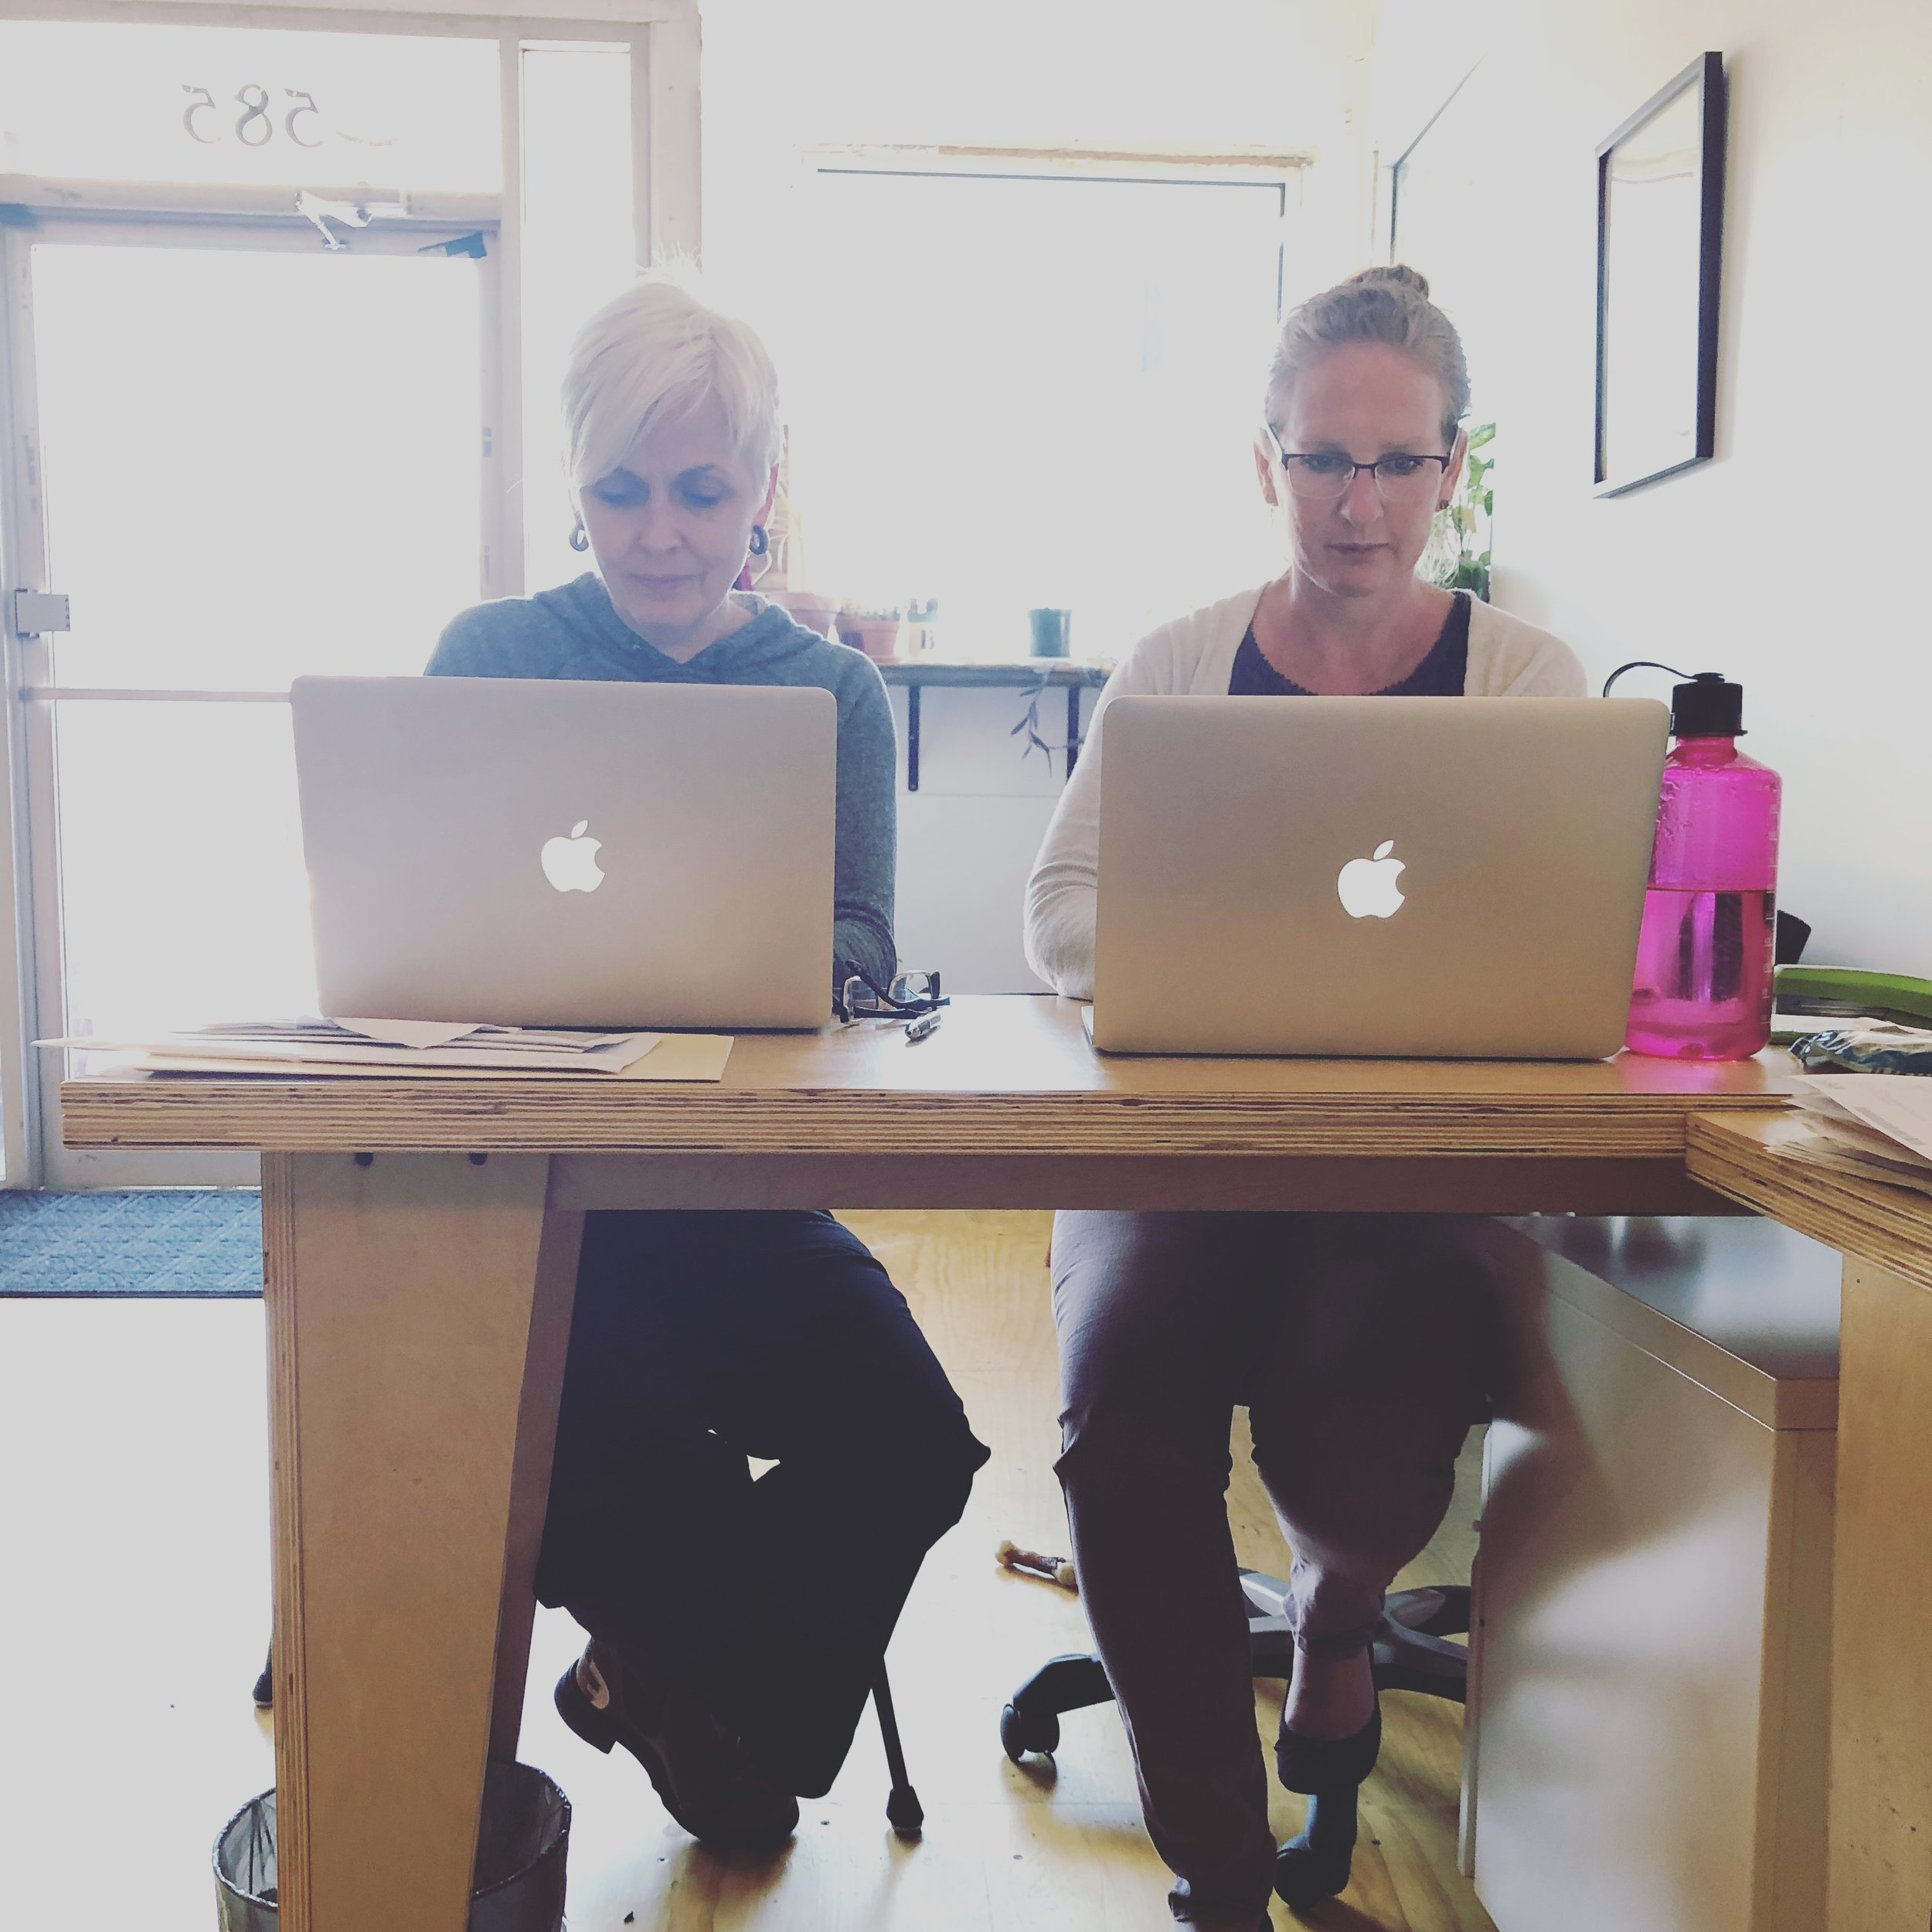 Cyd & Julie in New Office.JPG